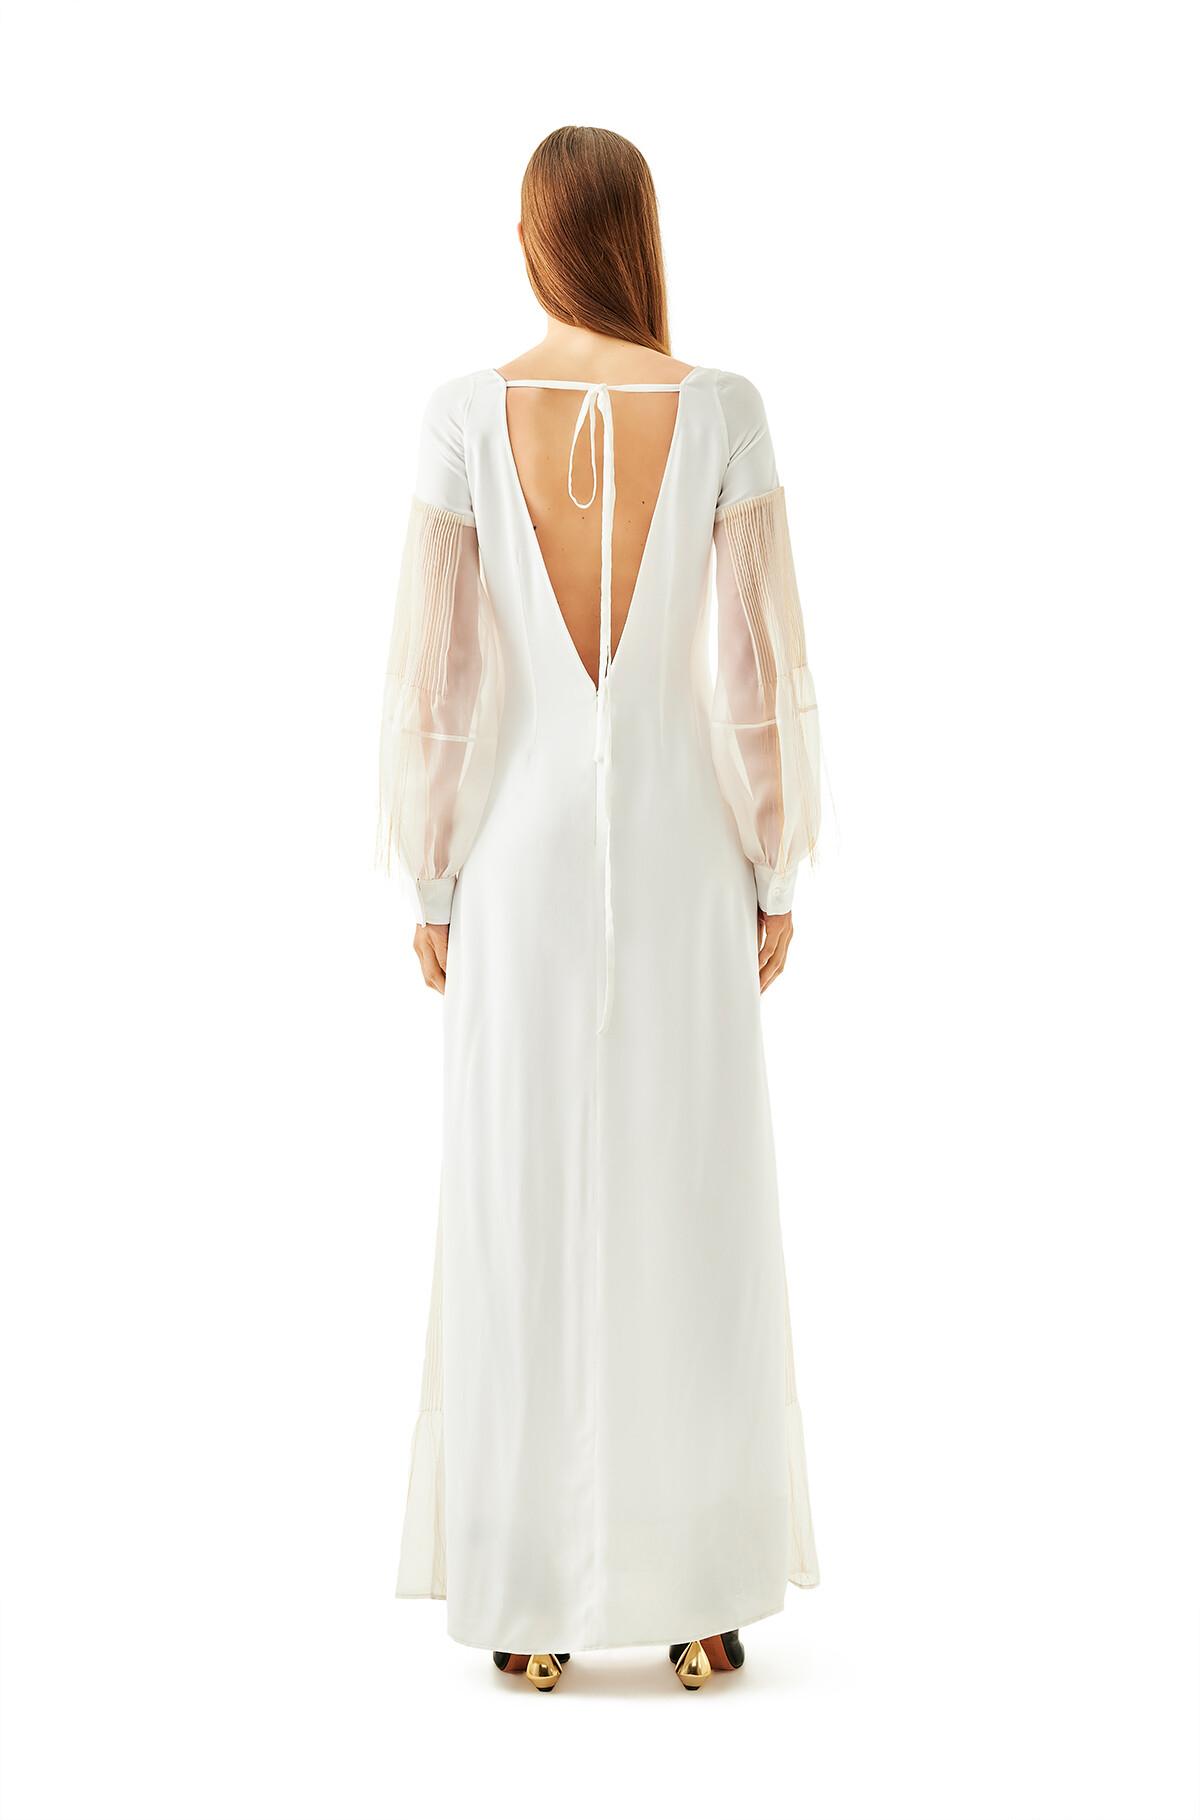 LOEWE Golden String Dress 白 front